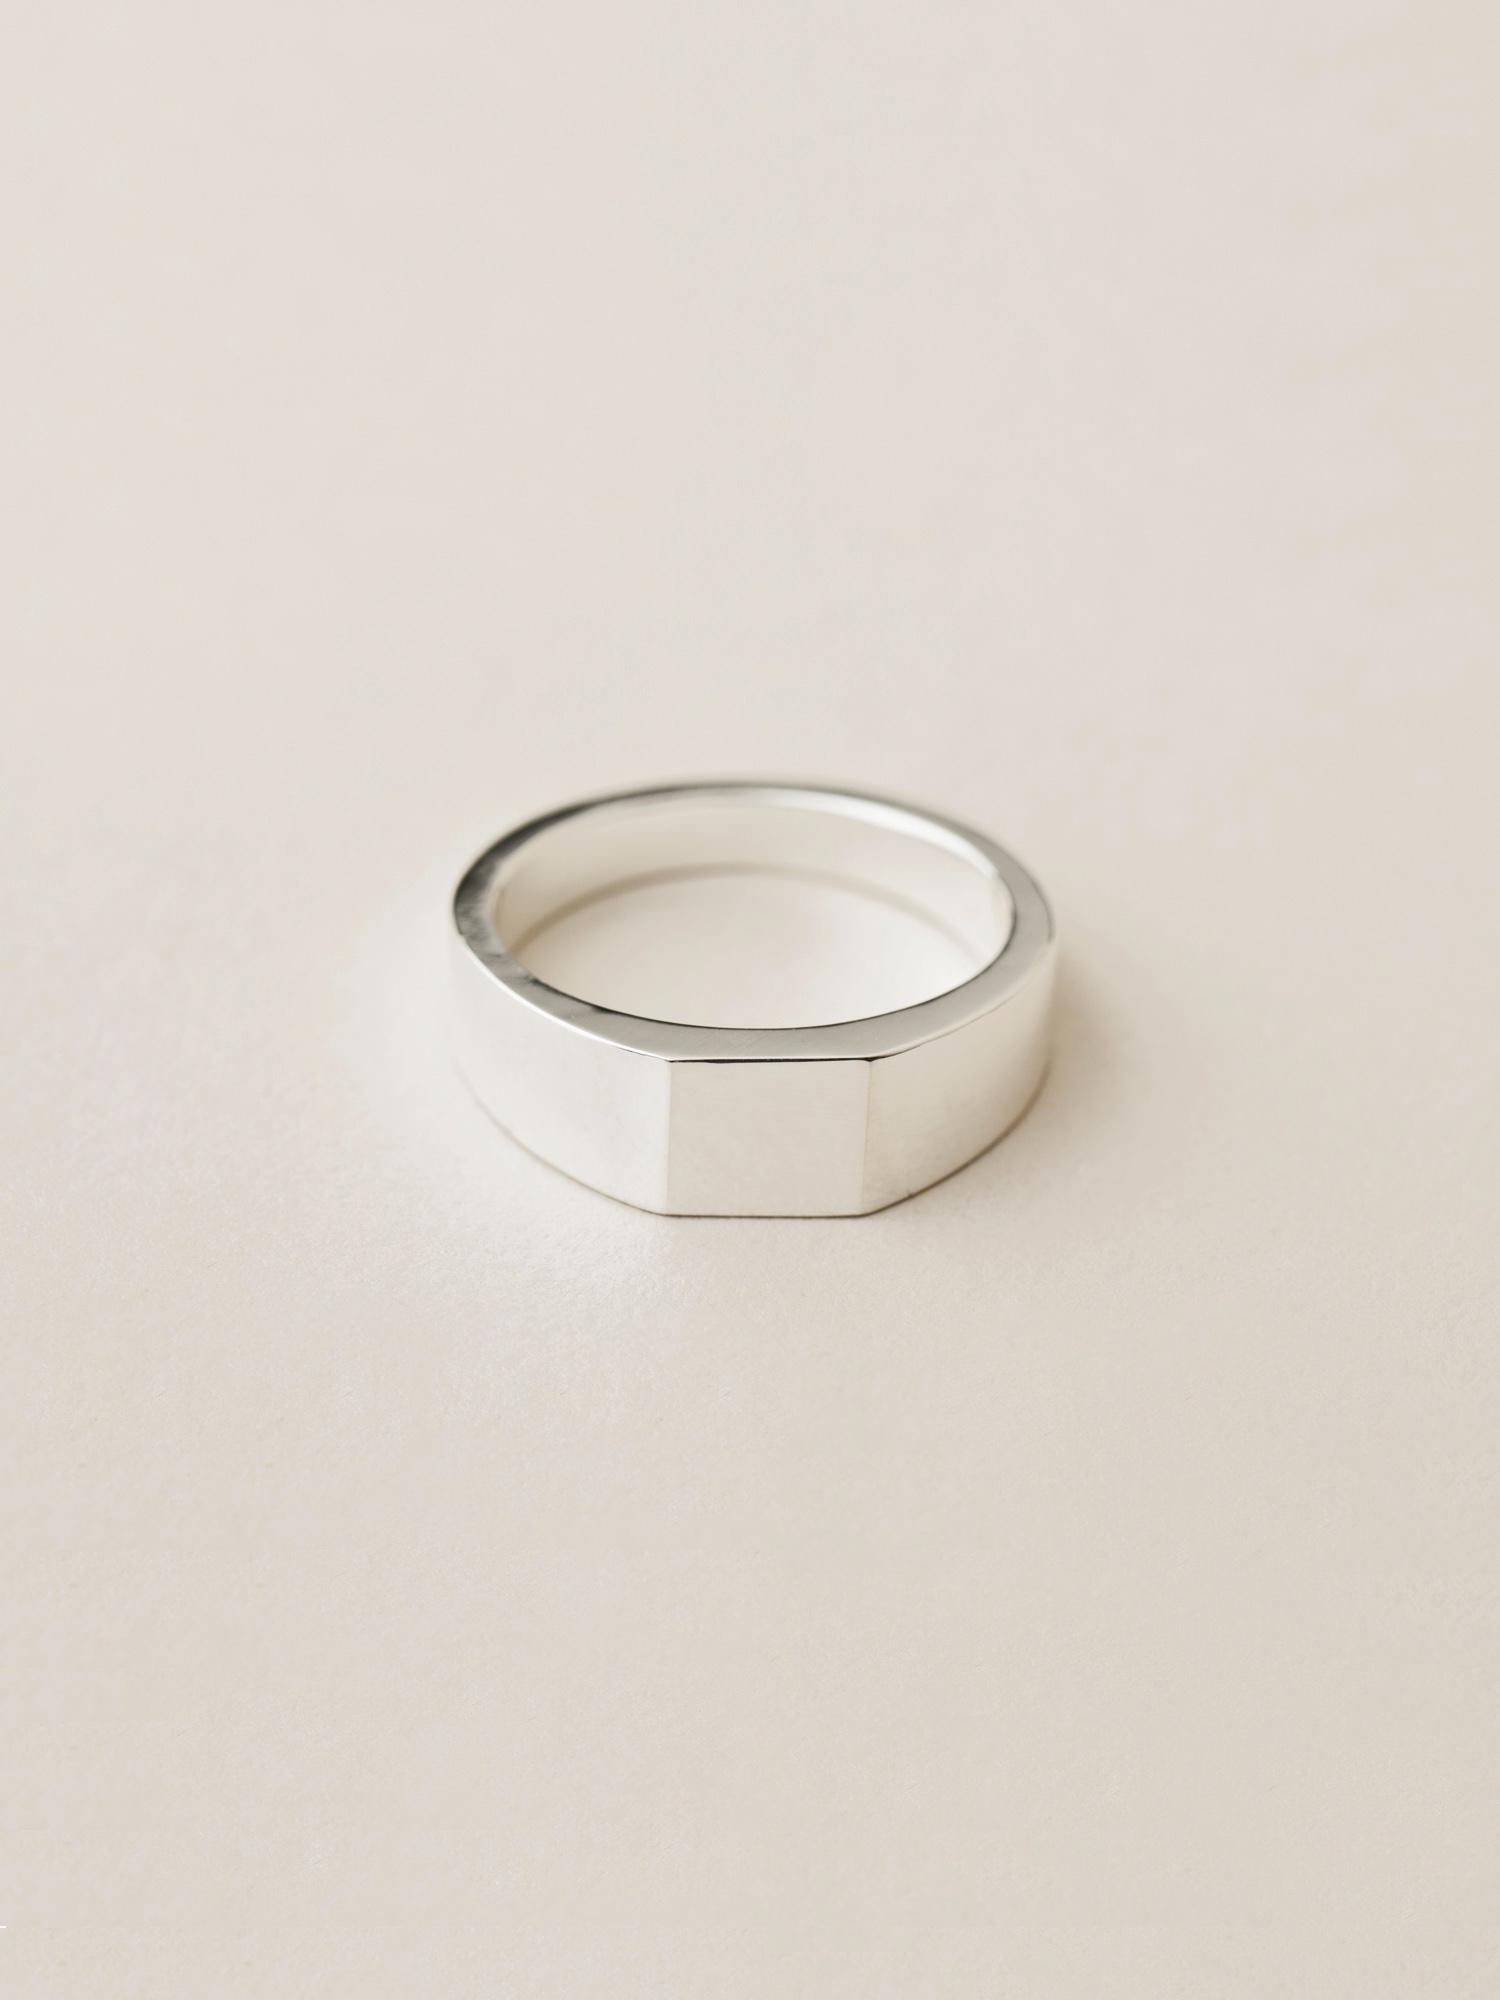 Siegelring Minima, mittel quadratisch in 925 Silber  Signet ring Minima, medium square in sterling silver